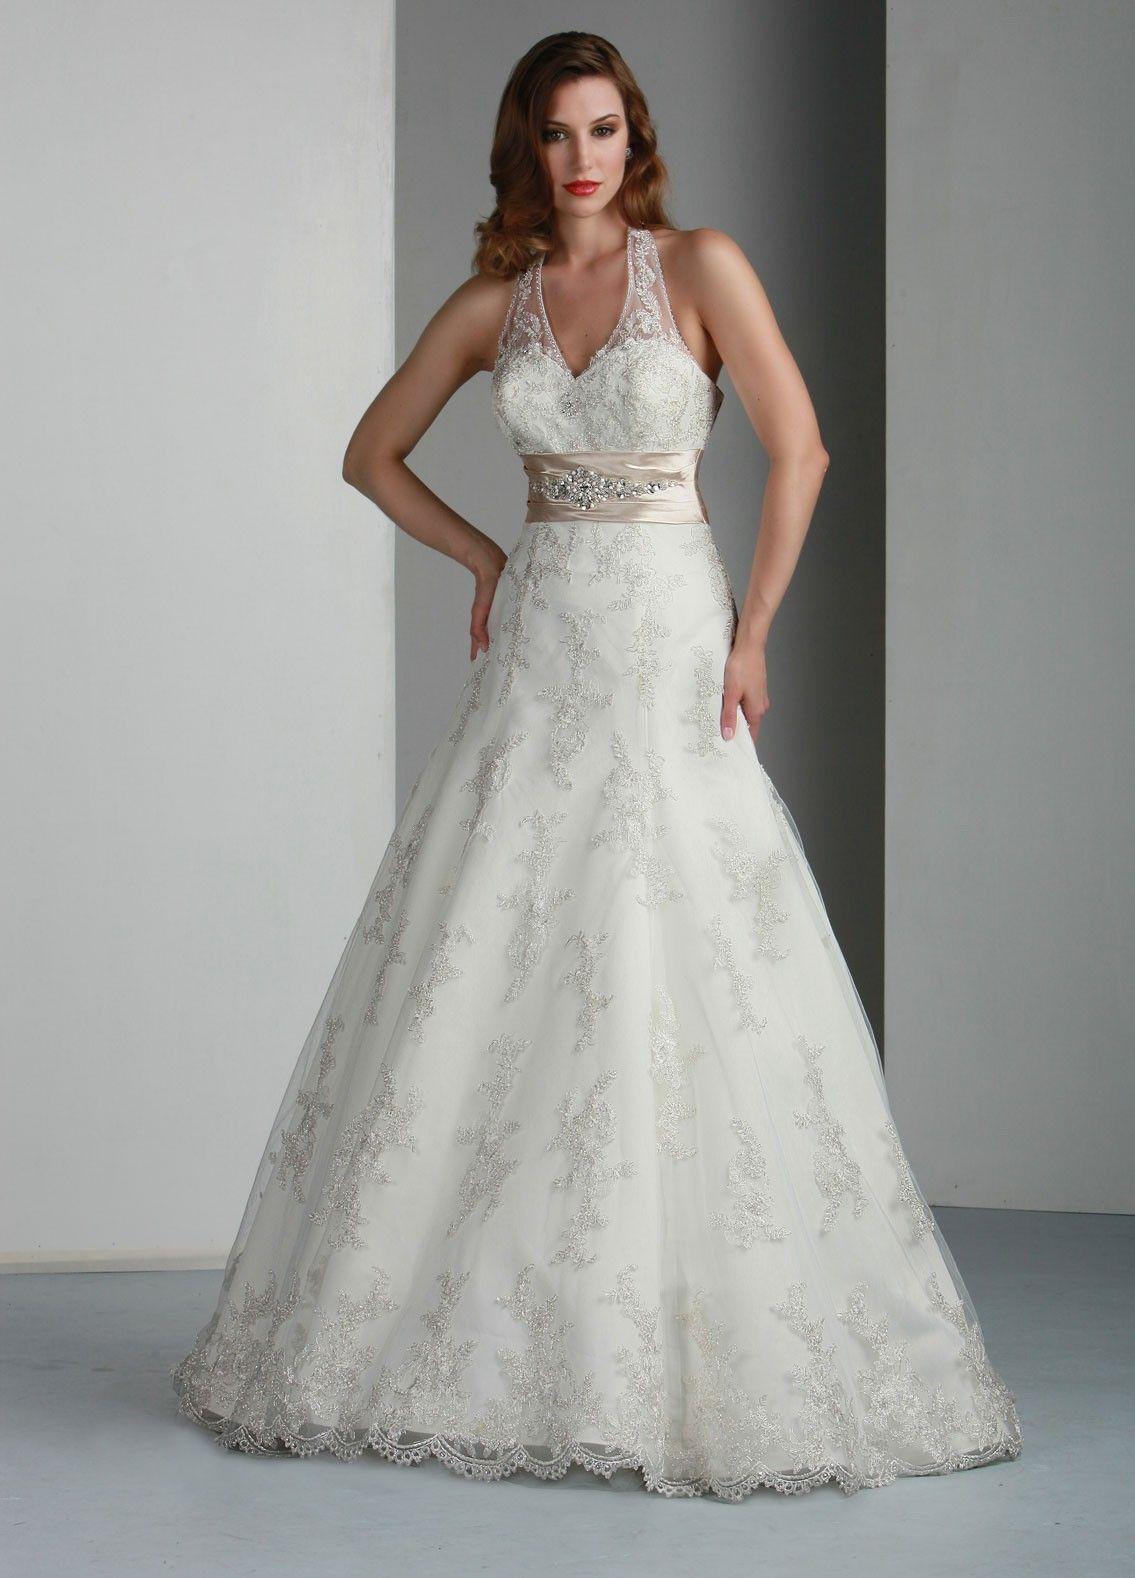 Beach halter wedding dresses halter wedding dress pinterest beach halter wedding dresses ombrellifo Gallery